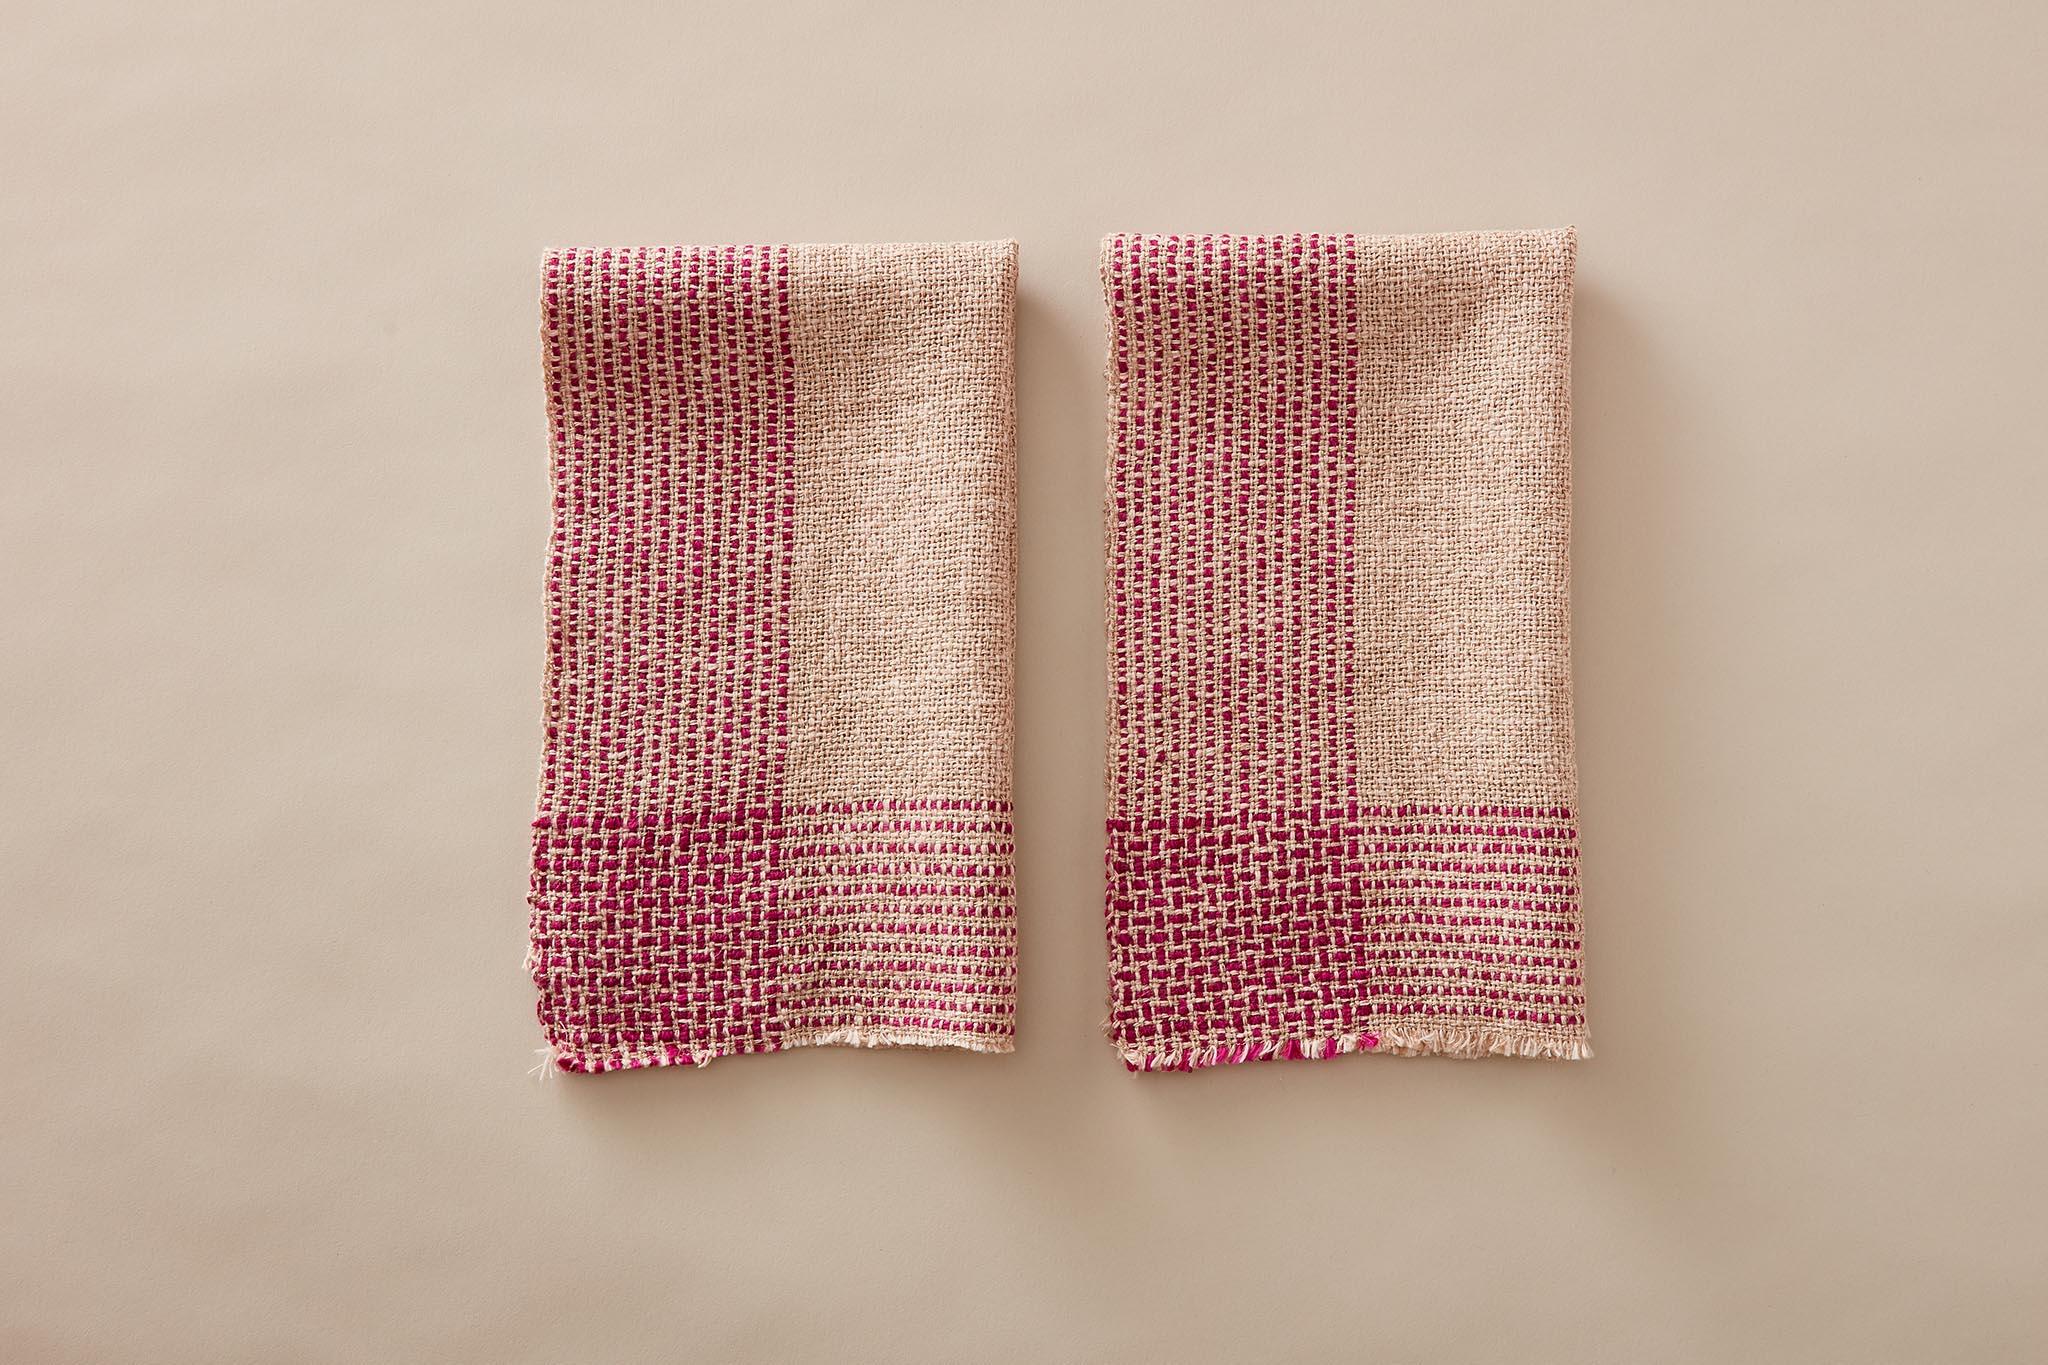 Handwoven Running Stitch Towels in Duet Yarn